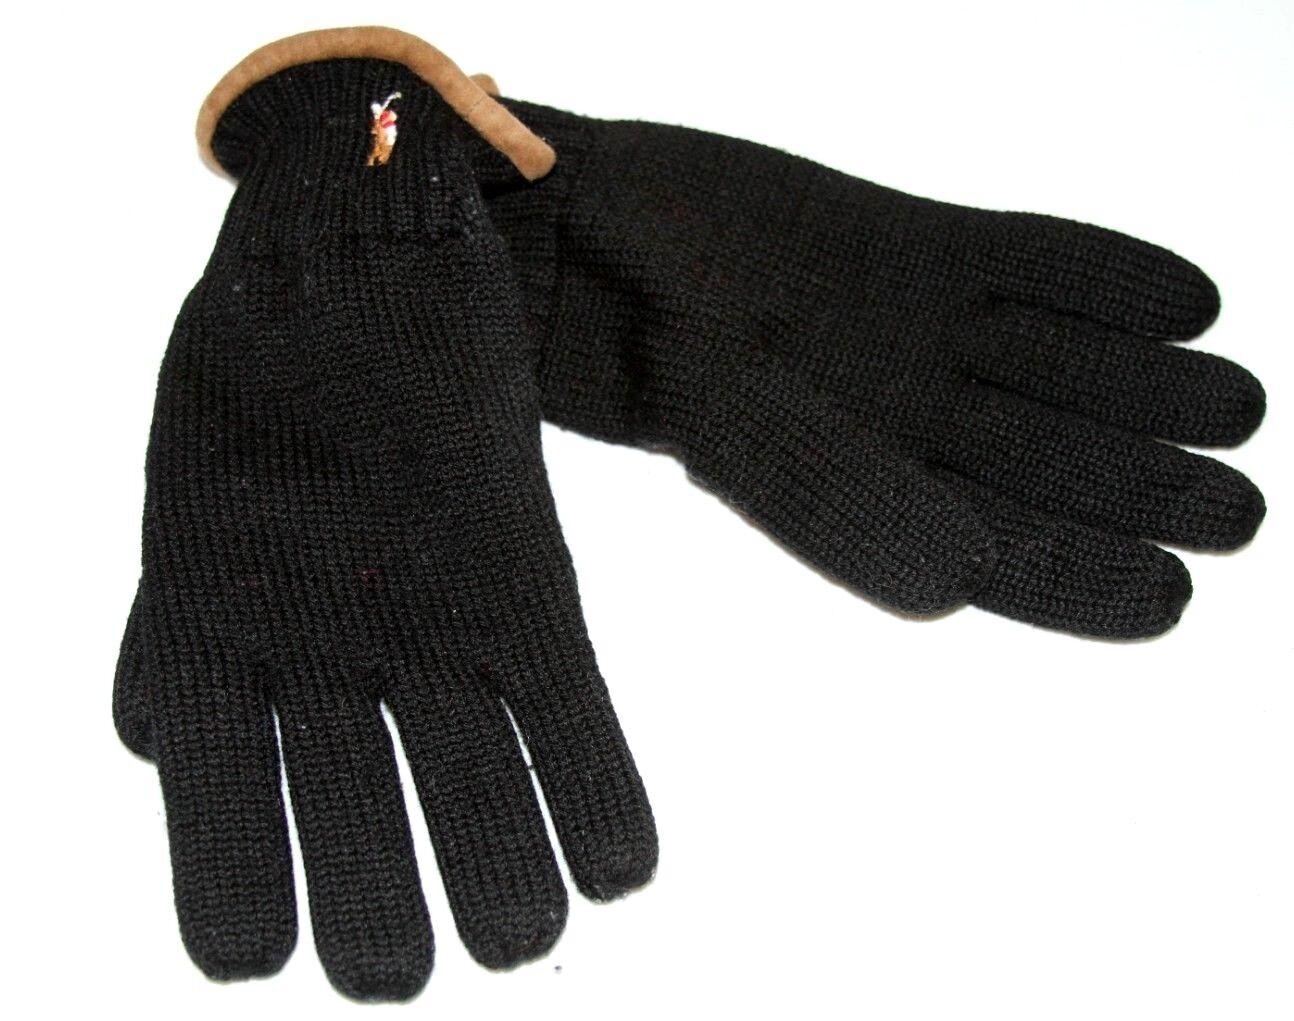 #15 Polo Ralph Lauren Para Hombres Clásico Lux la lana Merino Guantes Sz 0/S